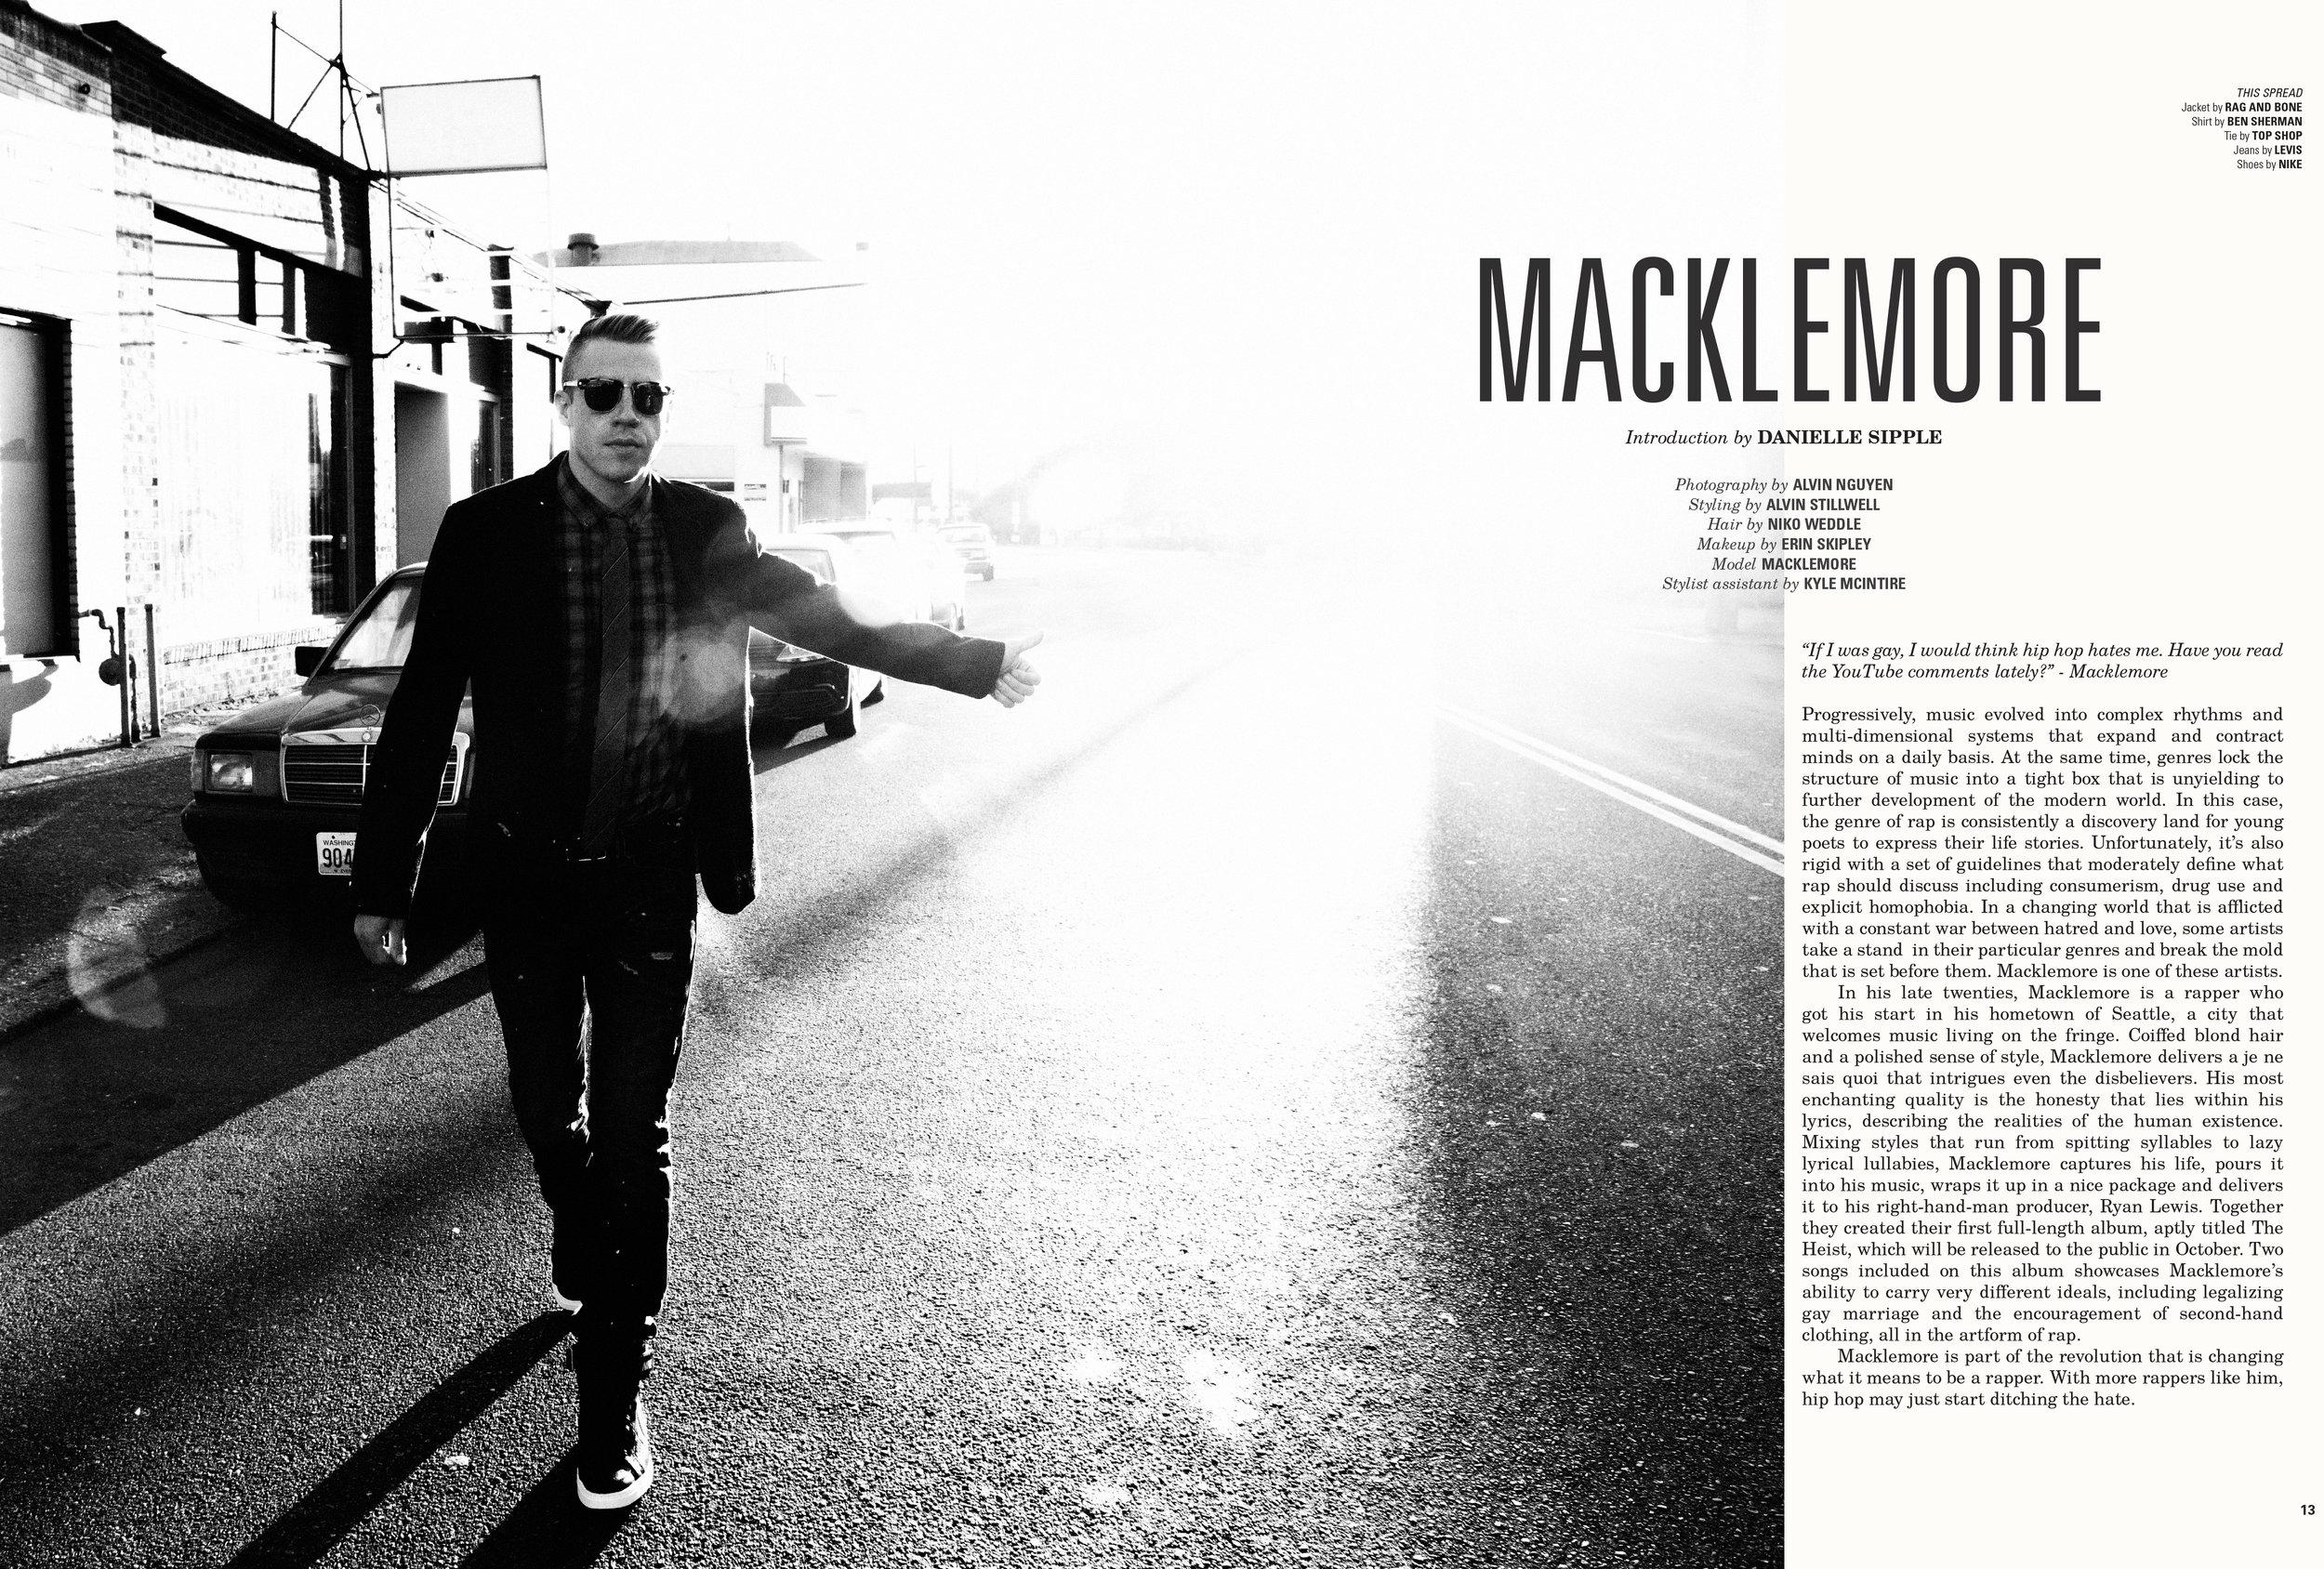 Macklemore 1.jpg